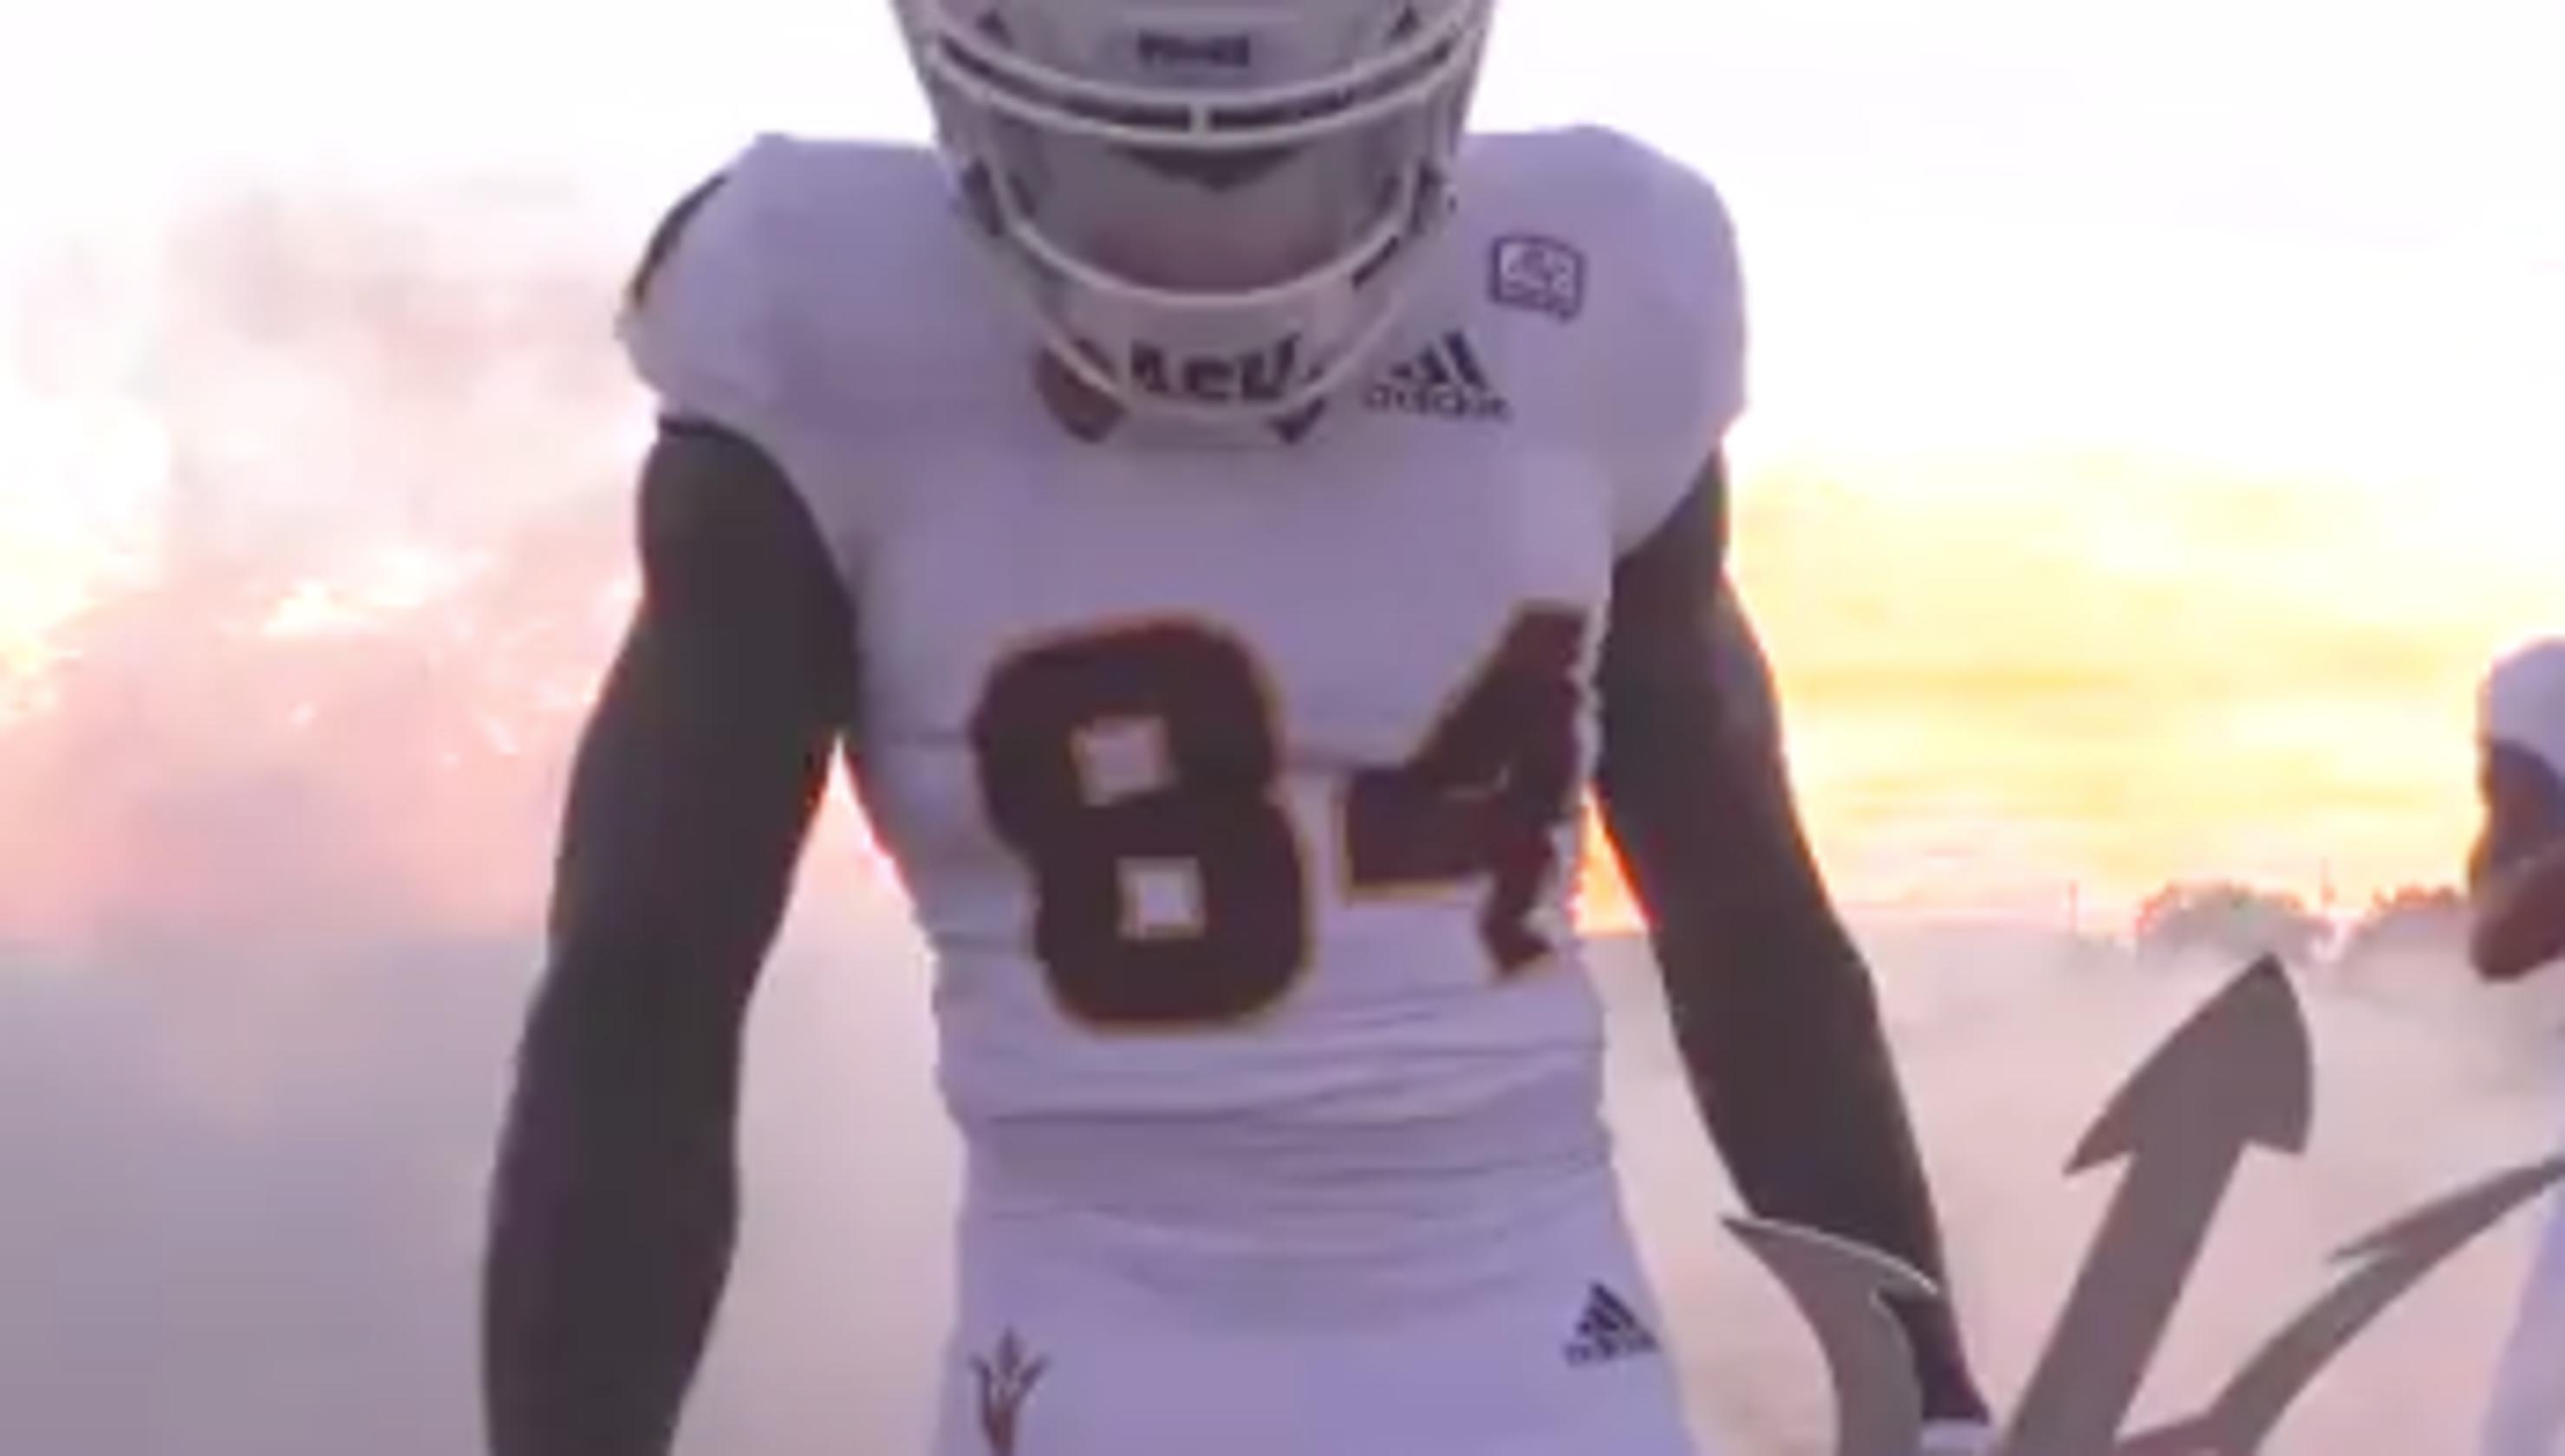 Oregon uniforms  Stark contrast for Saturday s Pac-12 college football game 3b354b7b4